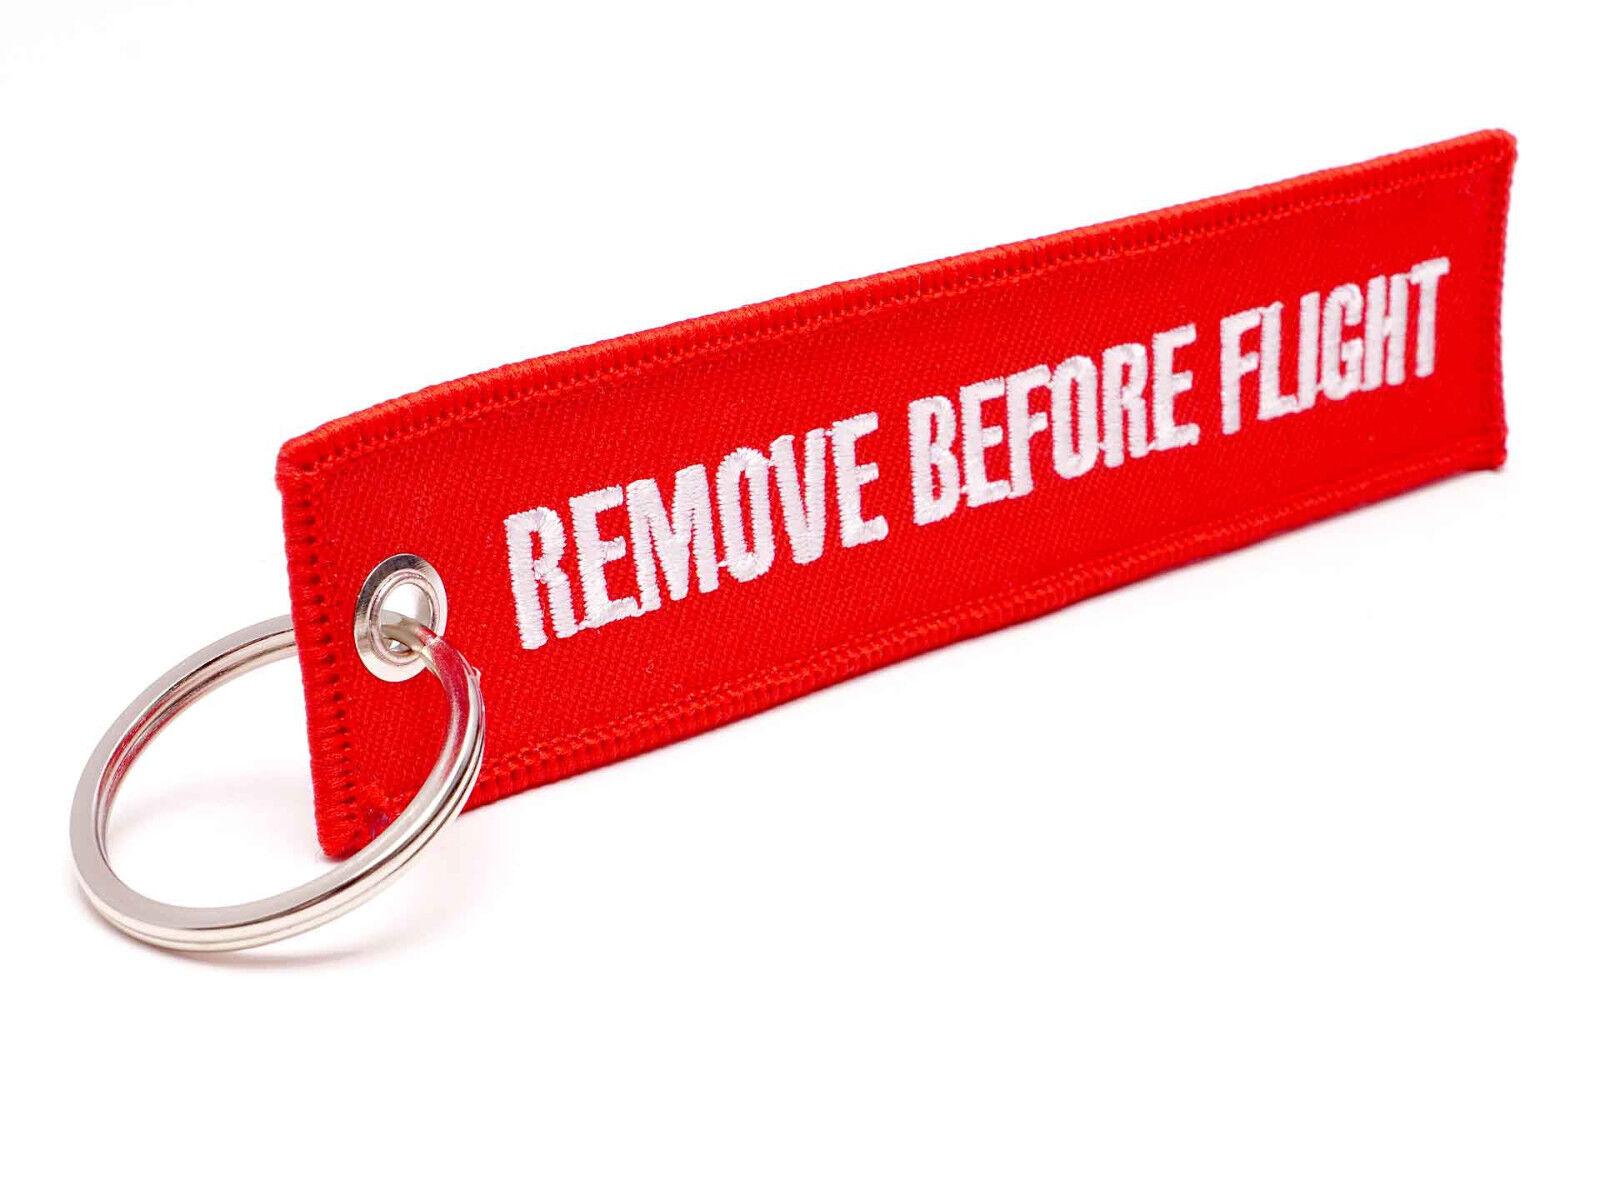 REMOVE BEFORE FLIGHT ® - Schlüsselanhänger in Rot - ORIGINAL EU MARKE